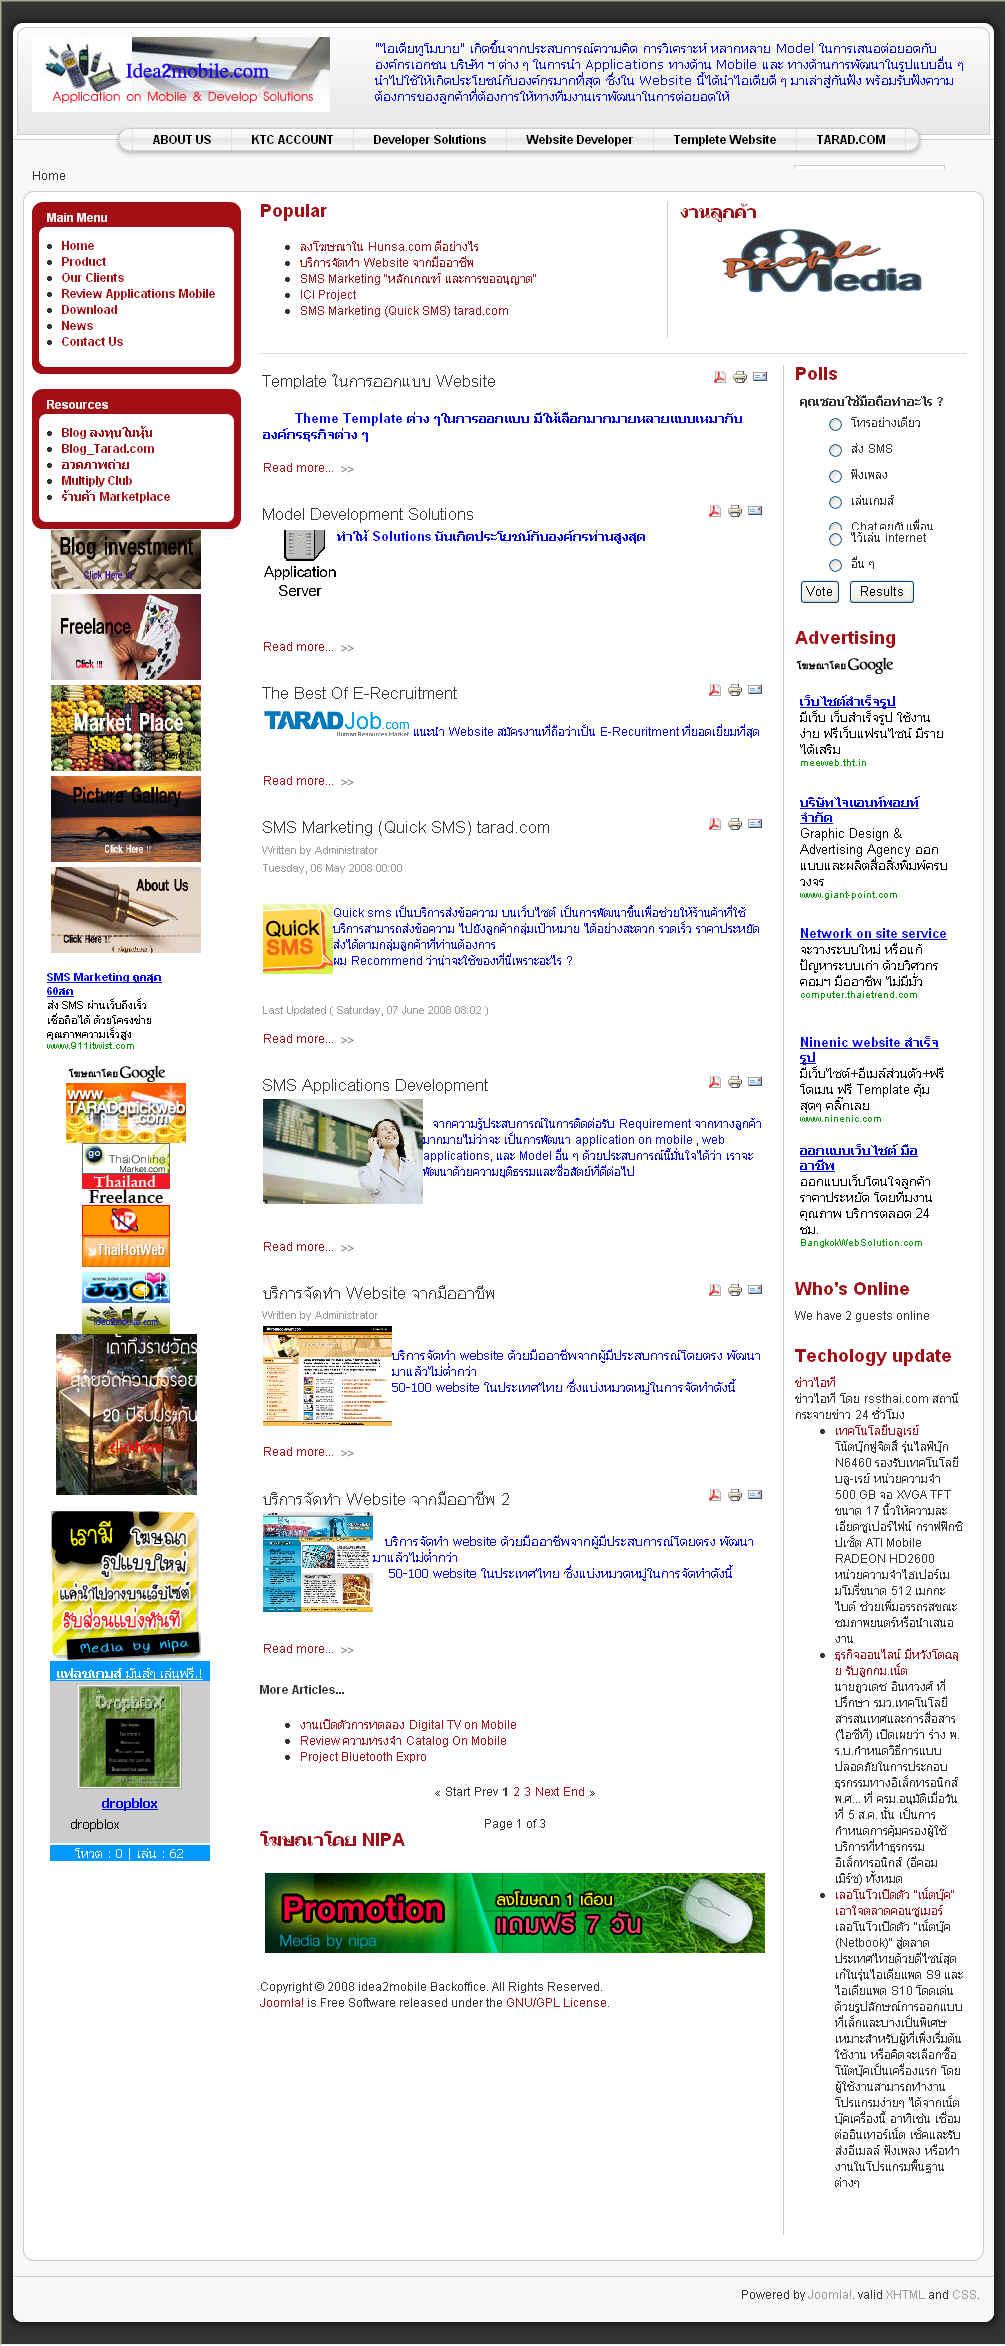 website idea2mobile.com พัฒนาให้เป็น joomla